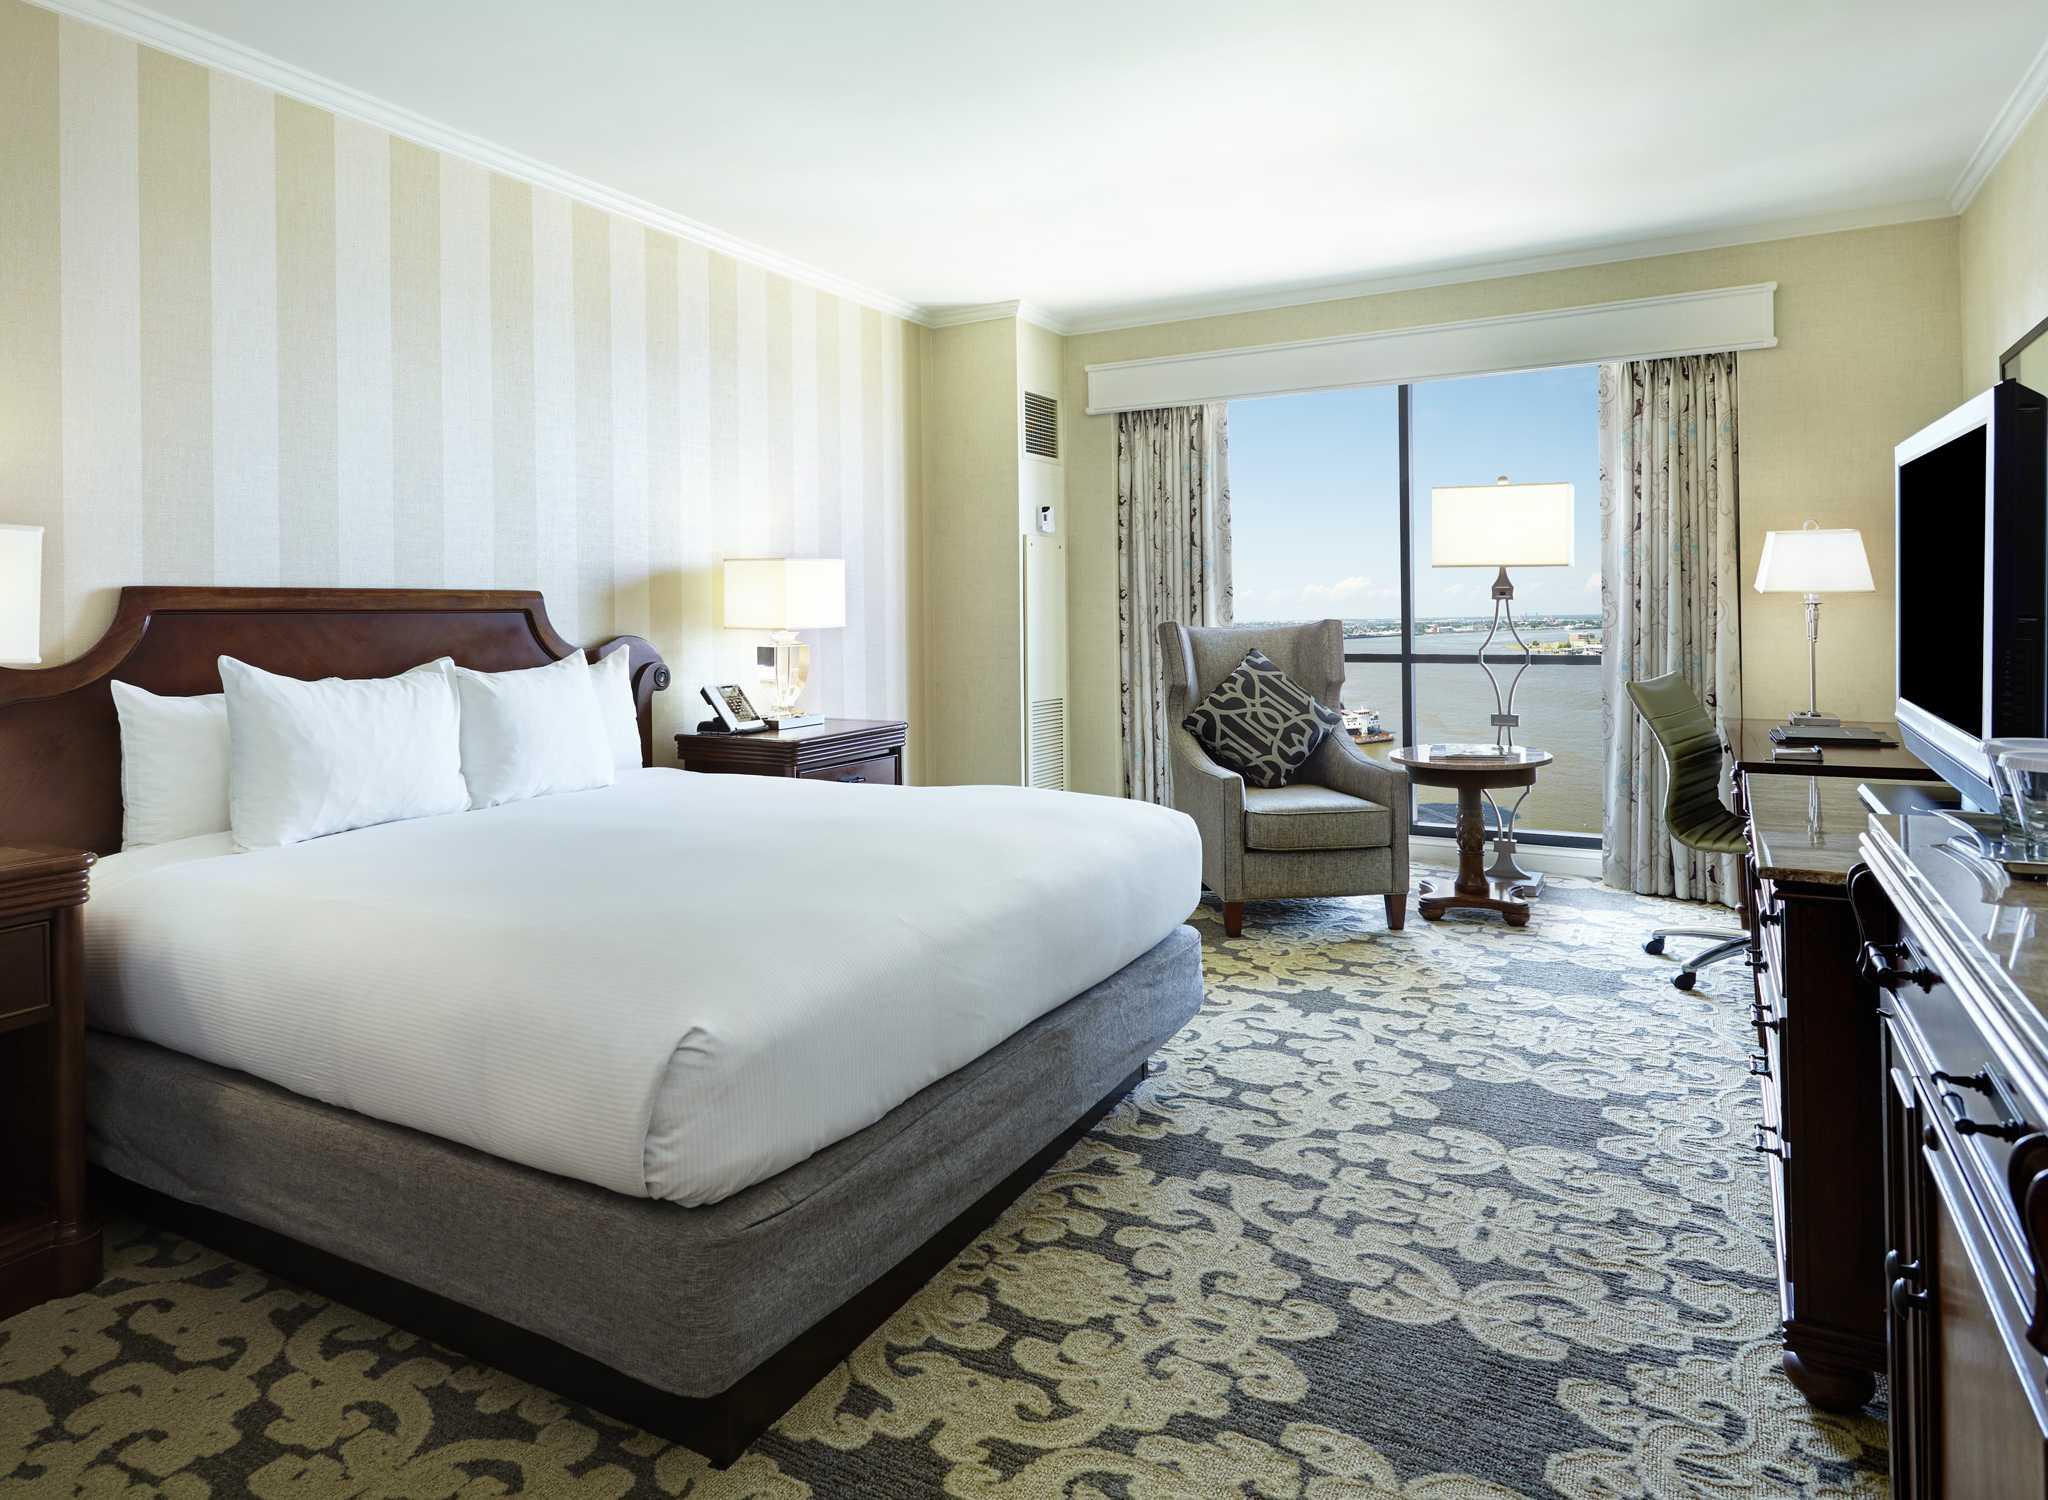 New Orleans 2 Bedroom Suites Staybridge Suites New